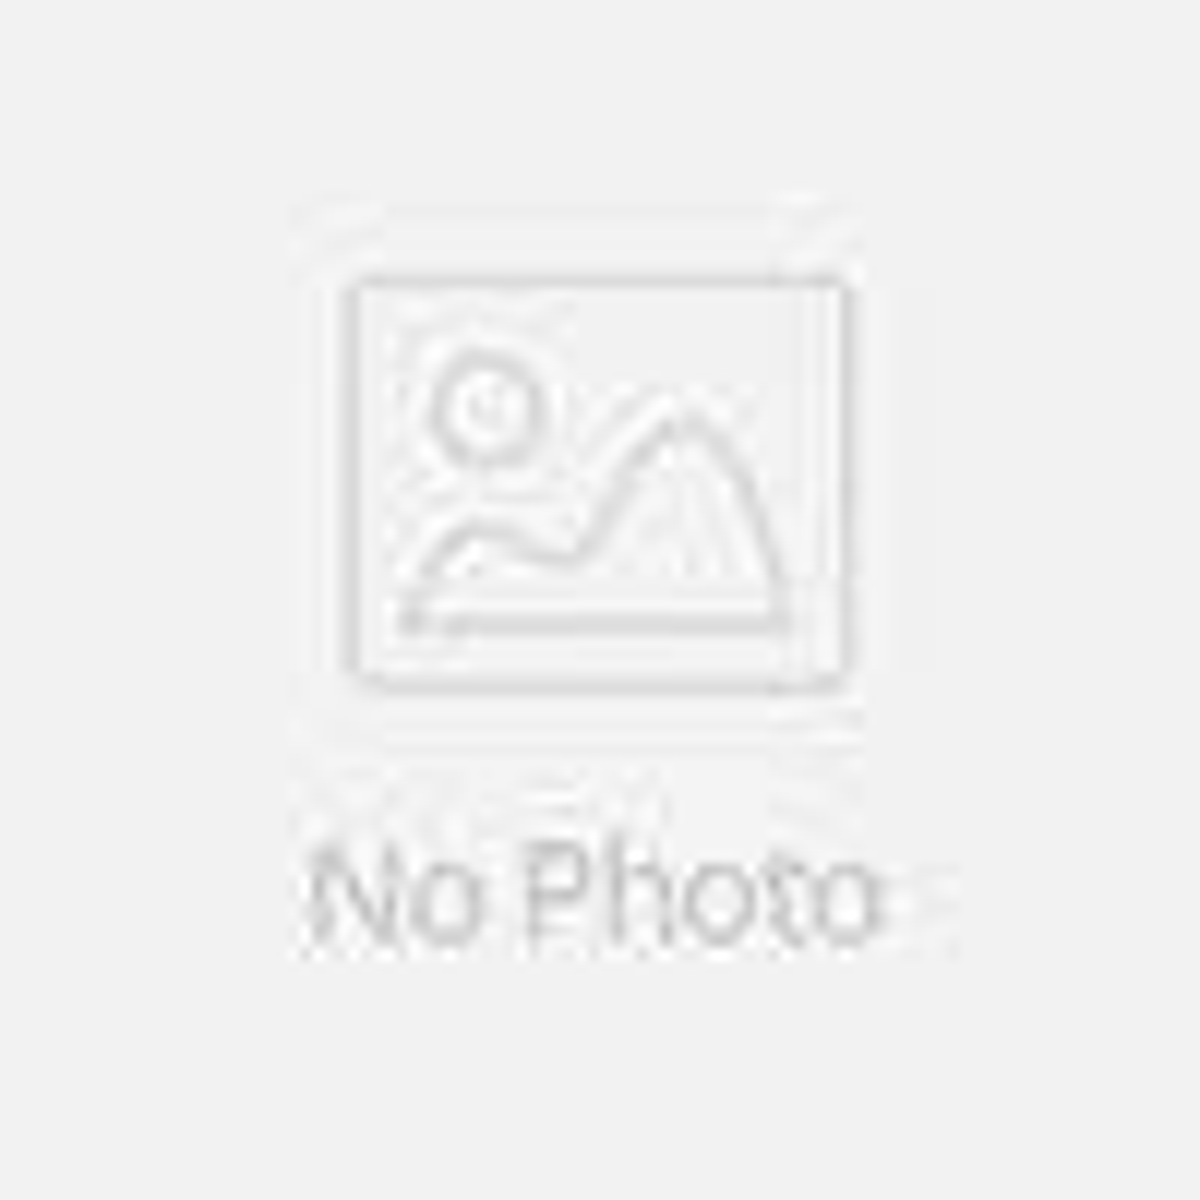 2013 female big bags women's bags portable one shoulder cross-body women's handbag dual